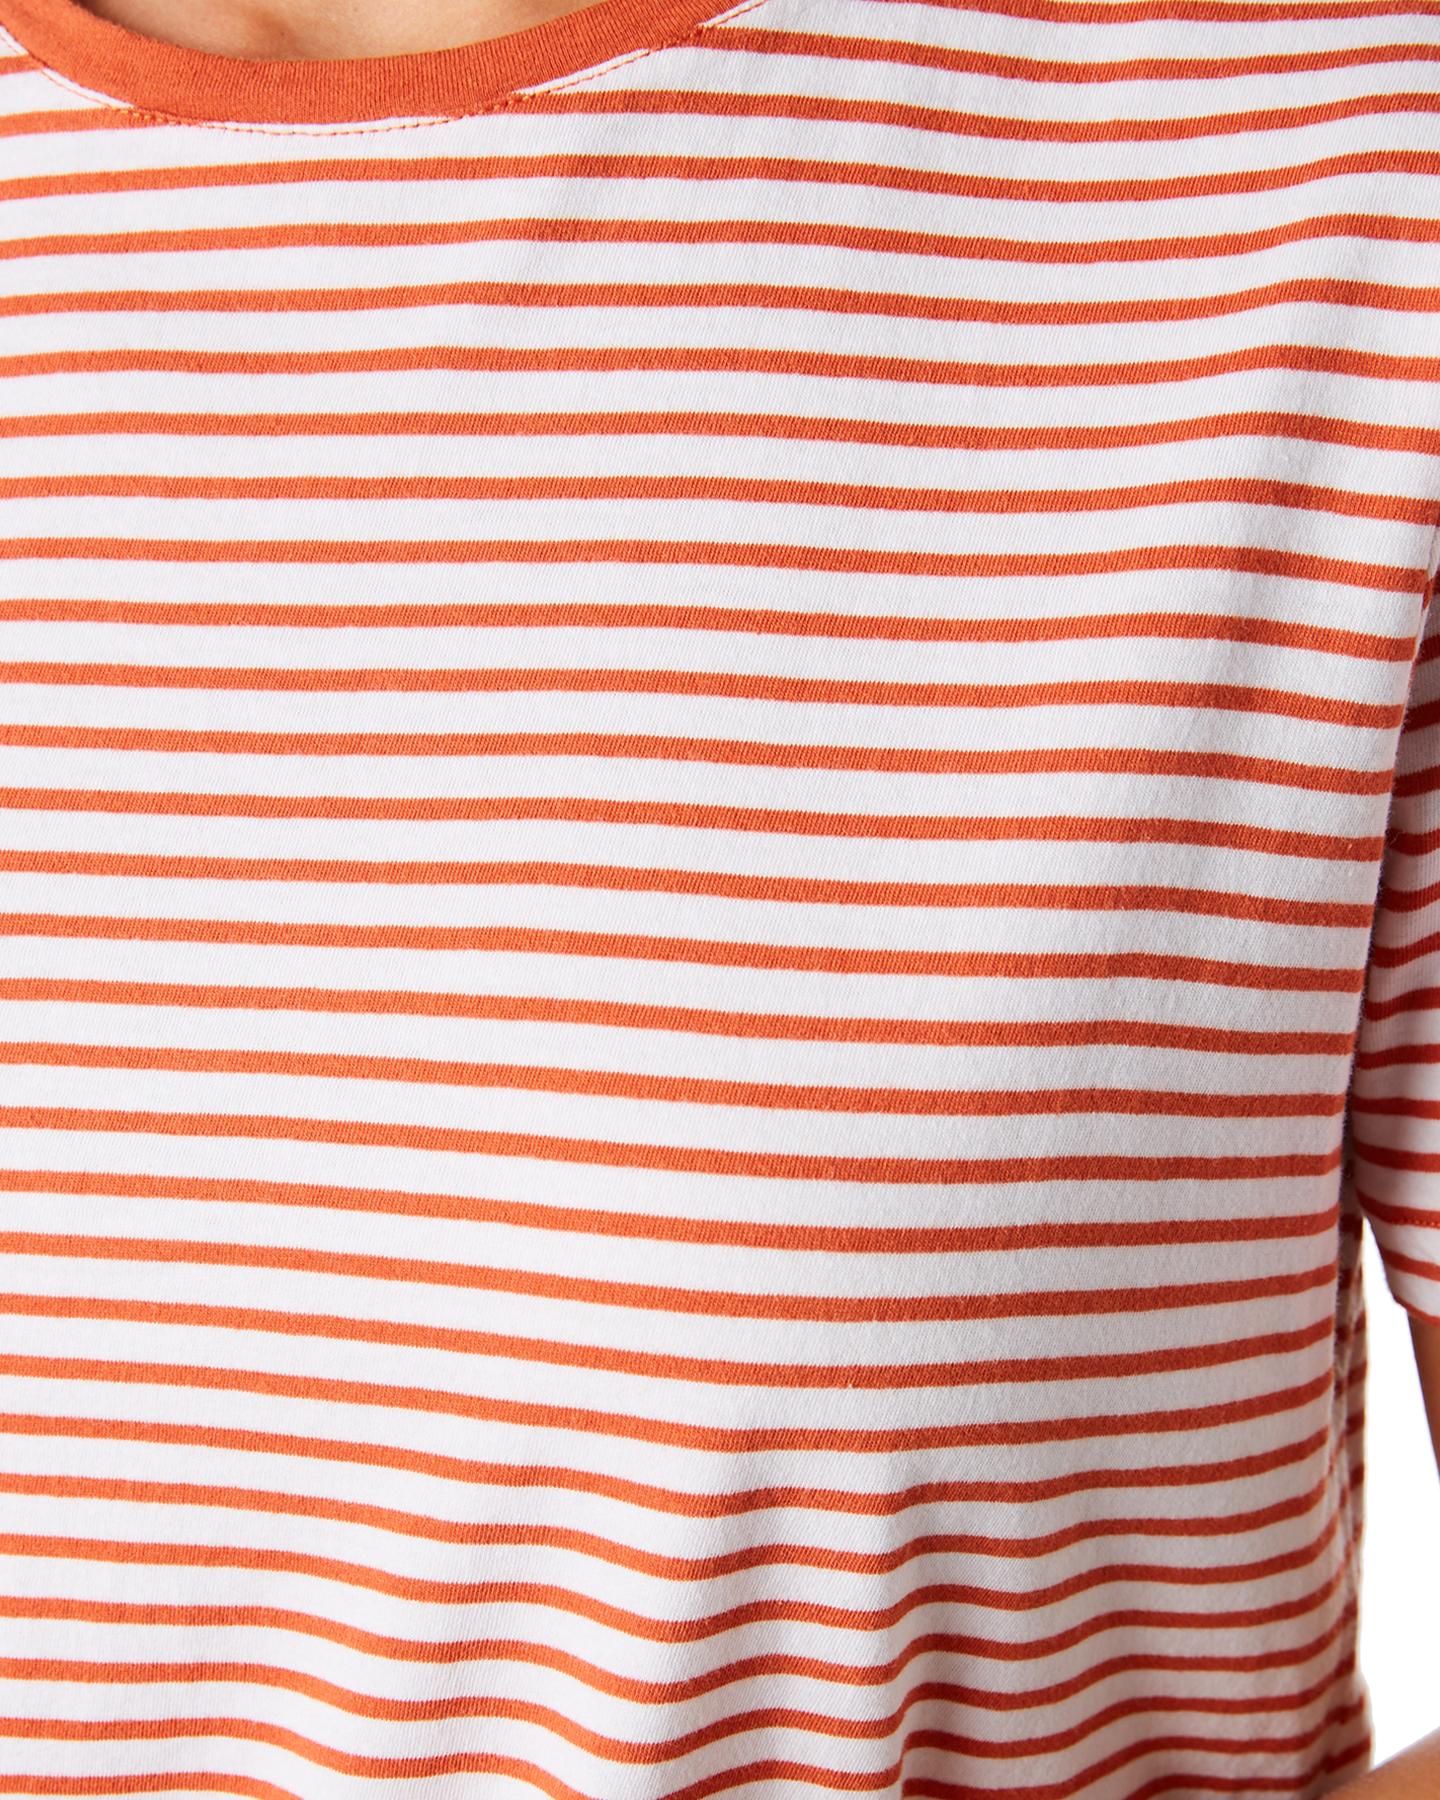 New-Swell-Women-039-s-Jesse-Stripe-Tee-Crew-Neck-Short-Sleeve-Cotton thumbnail 14